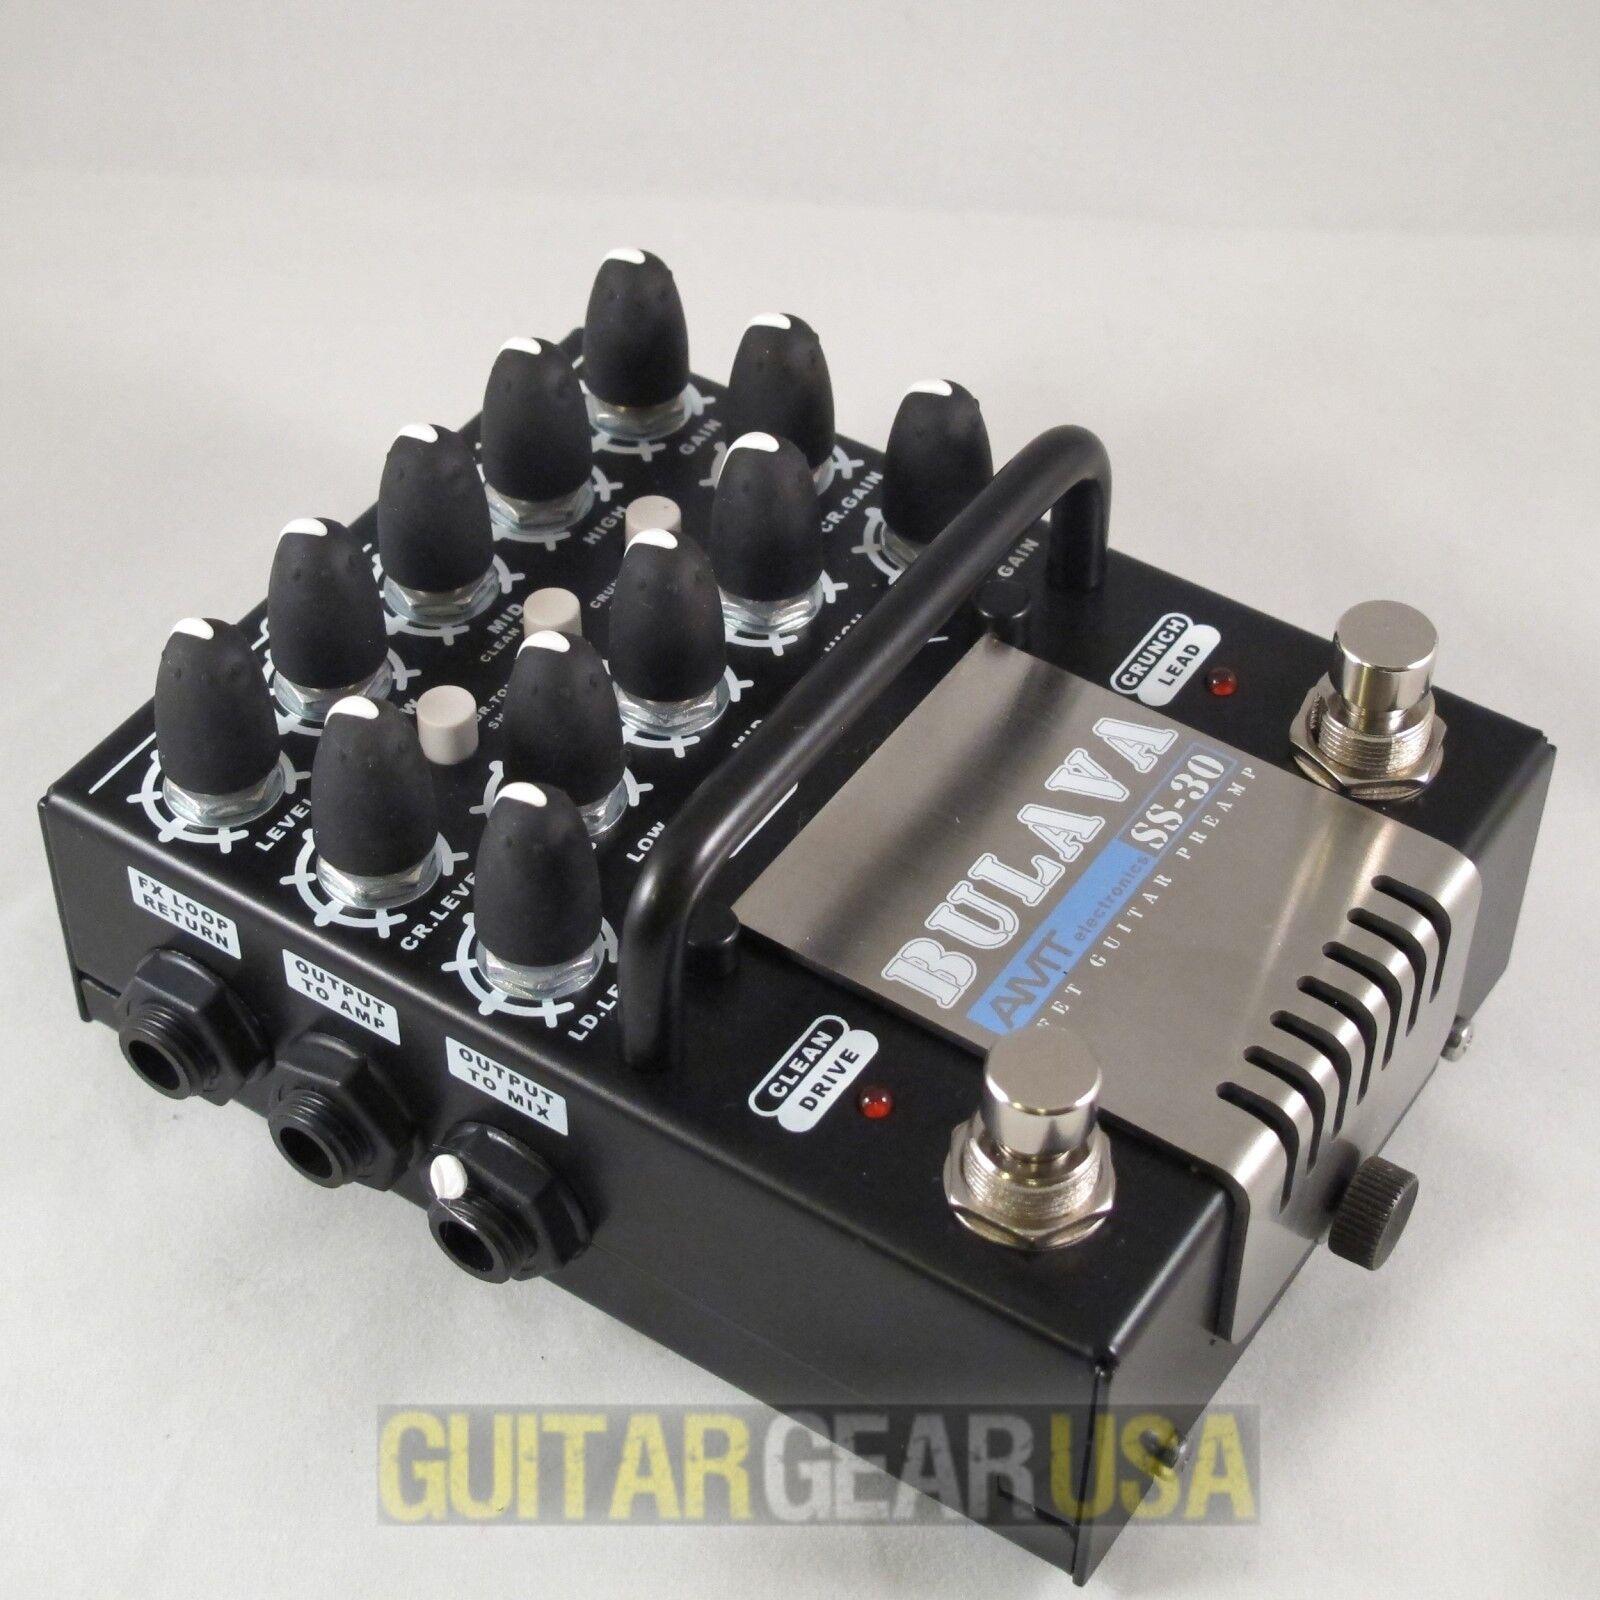 AMT ELECTRONICS GUITAR PEDAL PREAMP SS-30  BULAVA  3-channel JFET